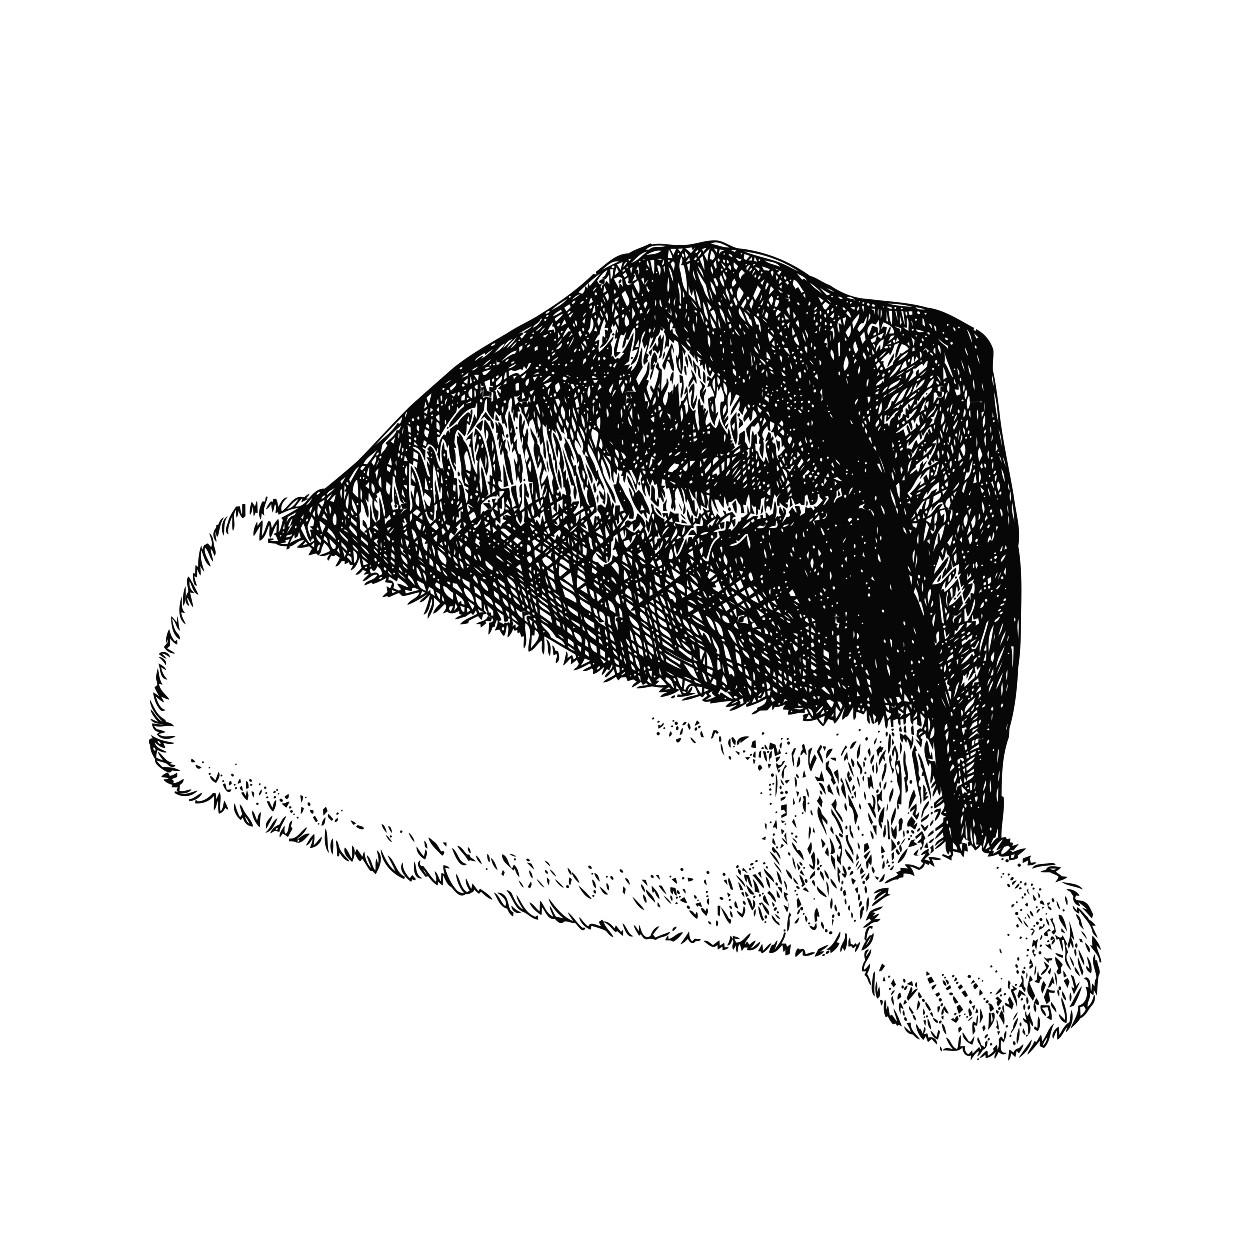 1235x1235 Santa Hat Drawing Printable Image Illustration Sketch For Santa